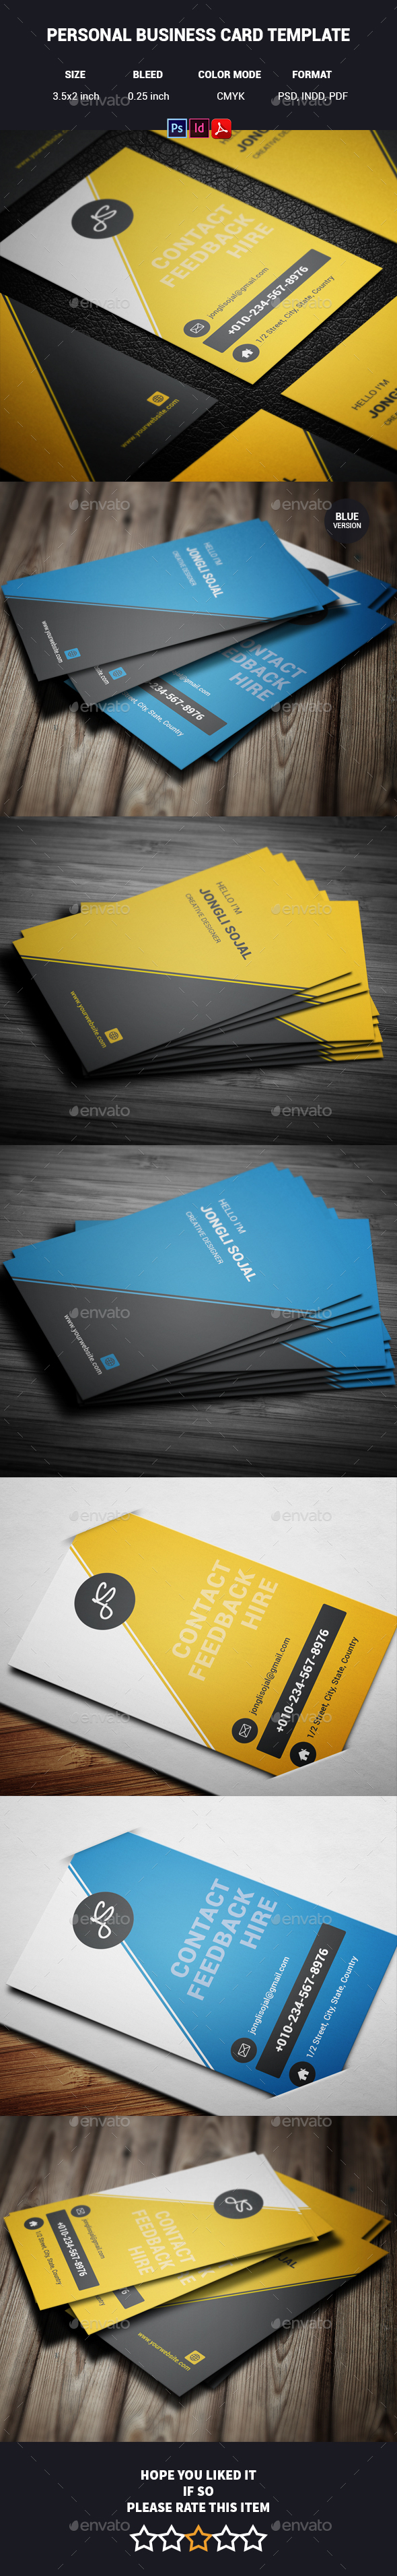 Personal Business Card Template by Jongli